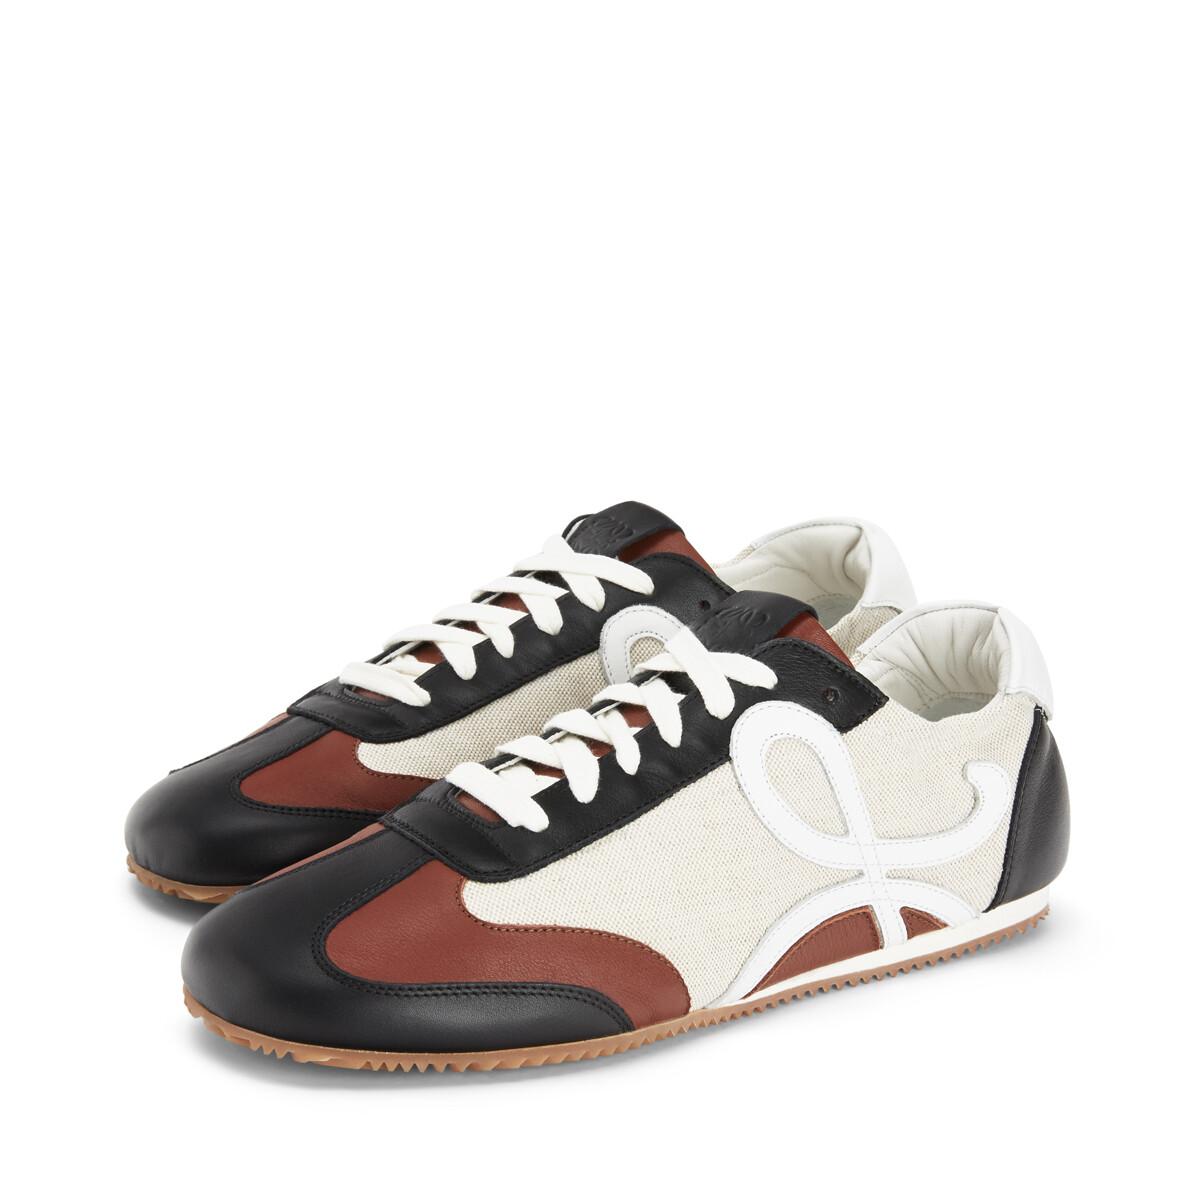 LOEWE Sneaker Arena/Marrón Oscuro front